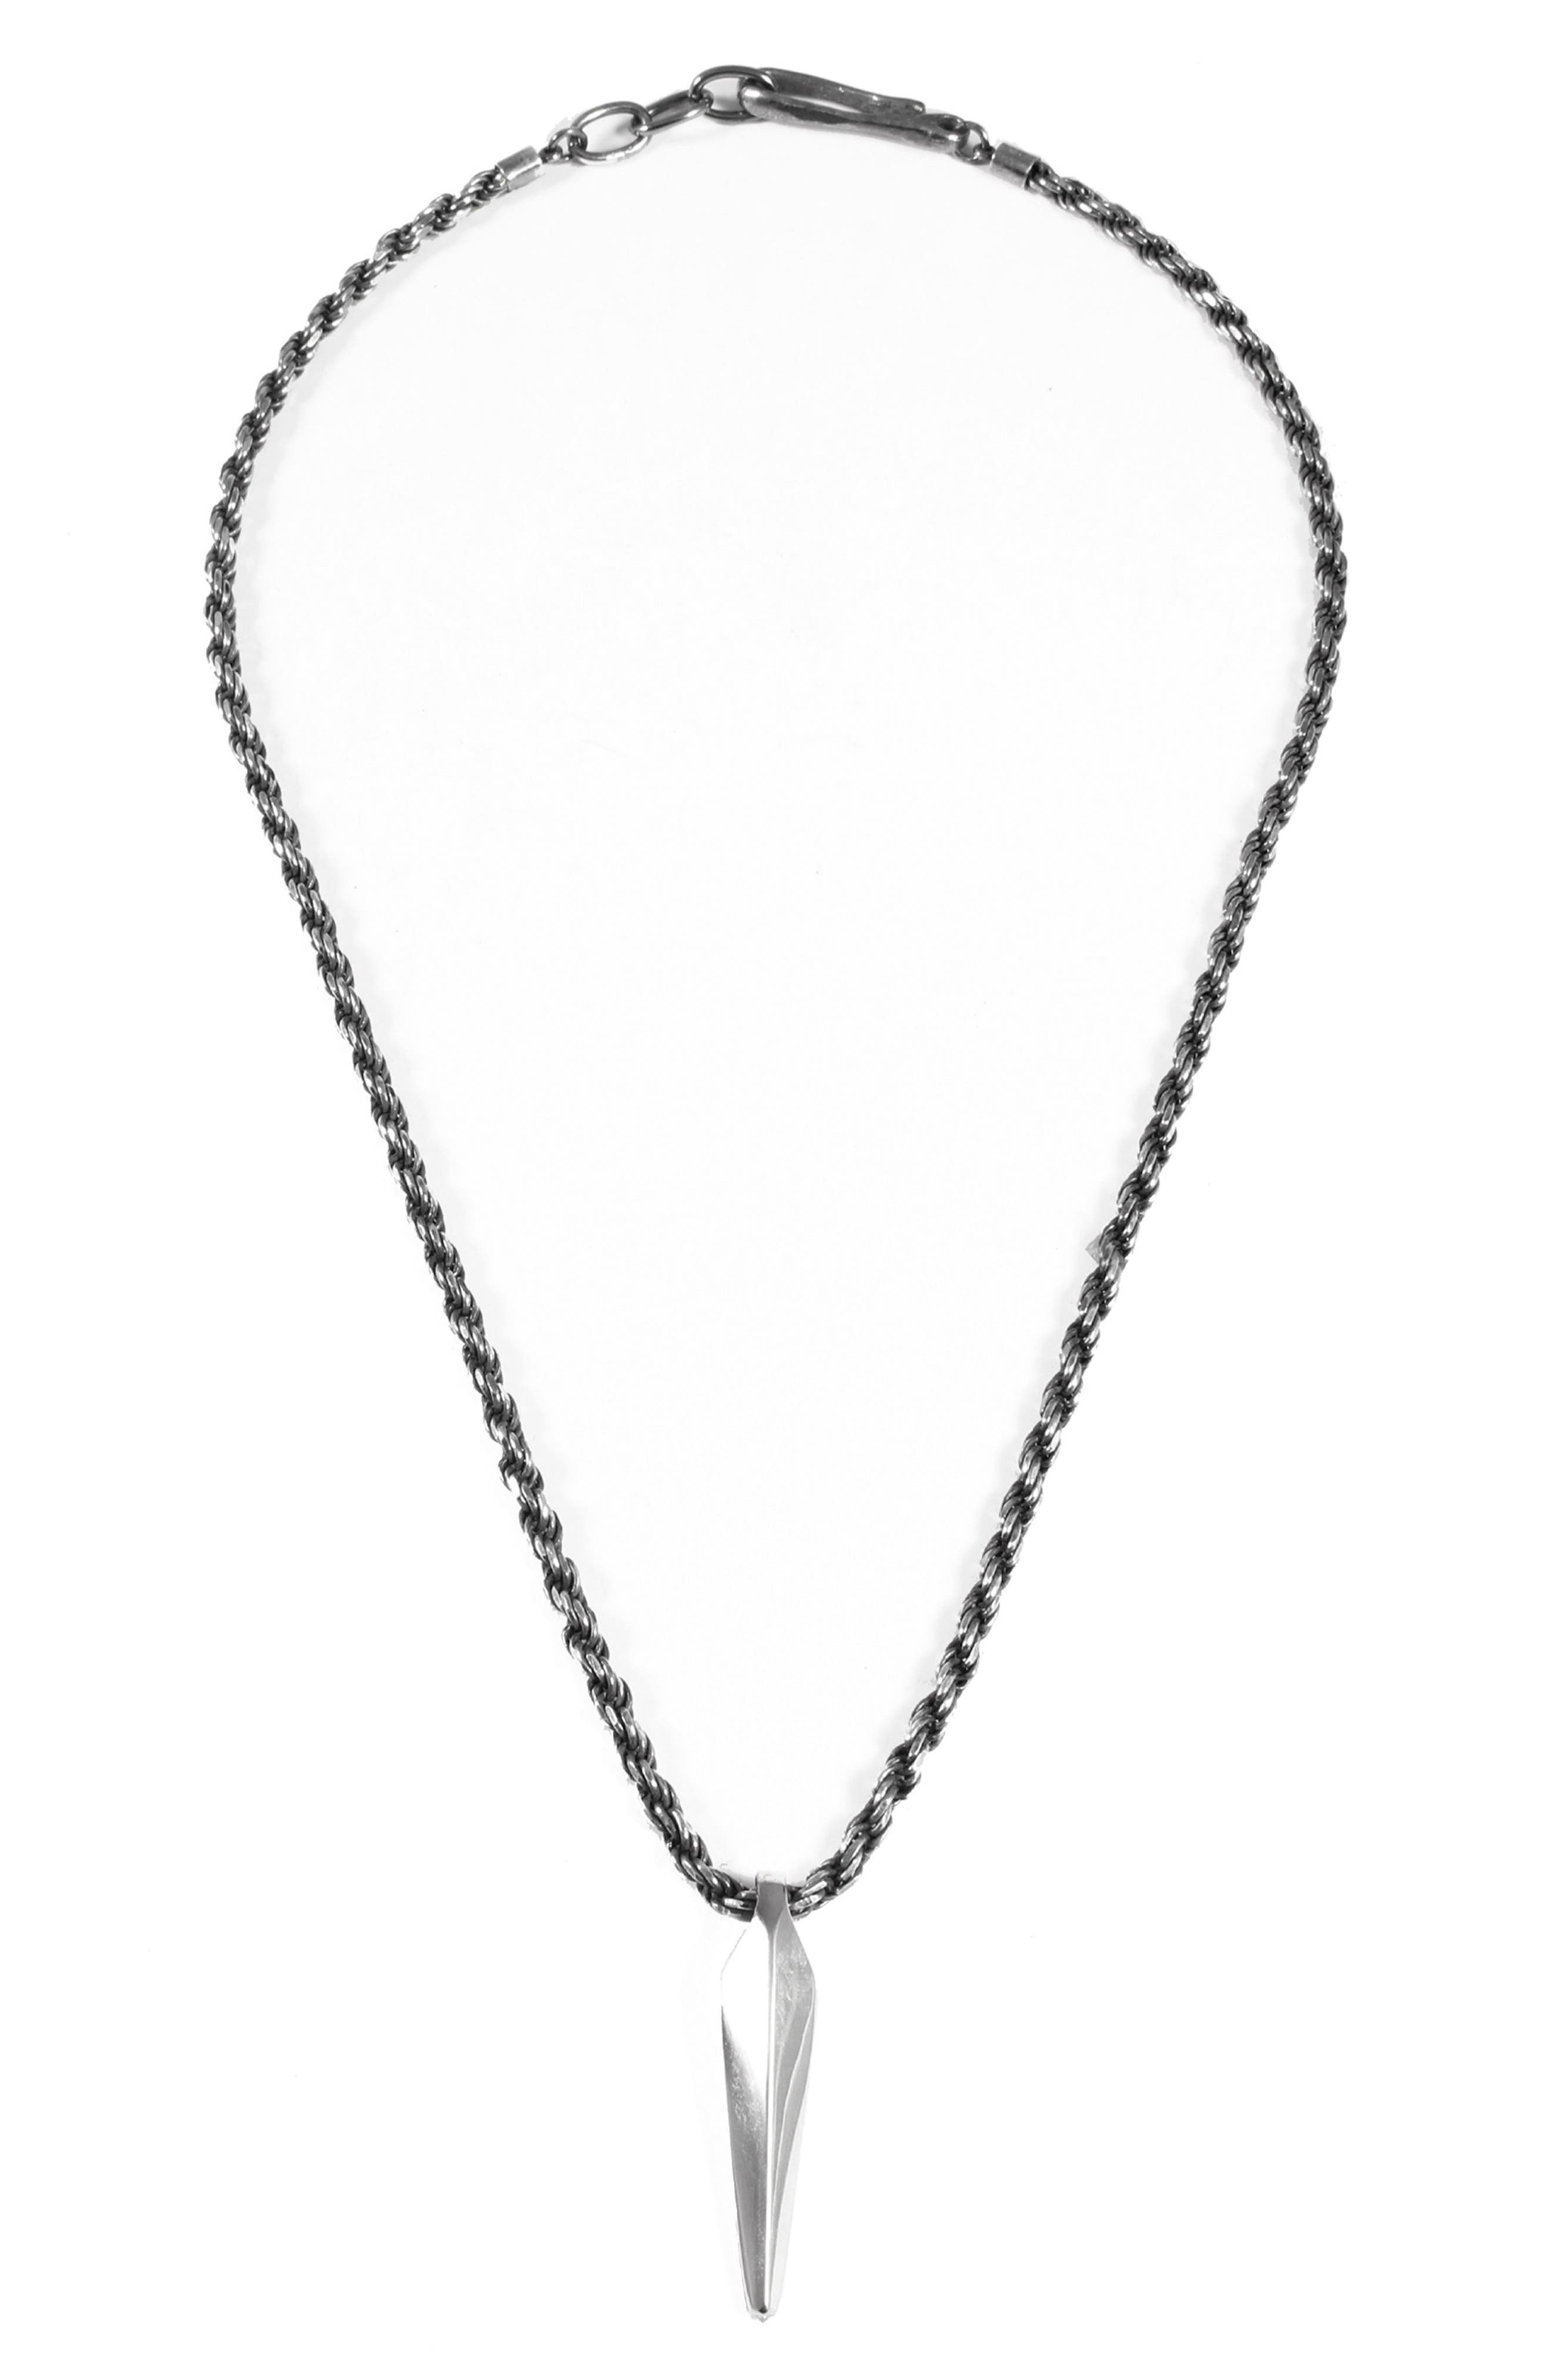 Fortitude Pendant Necklace,                             Main thumbnail 1, color,                             040